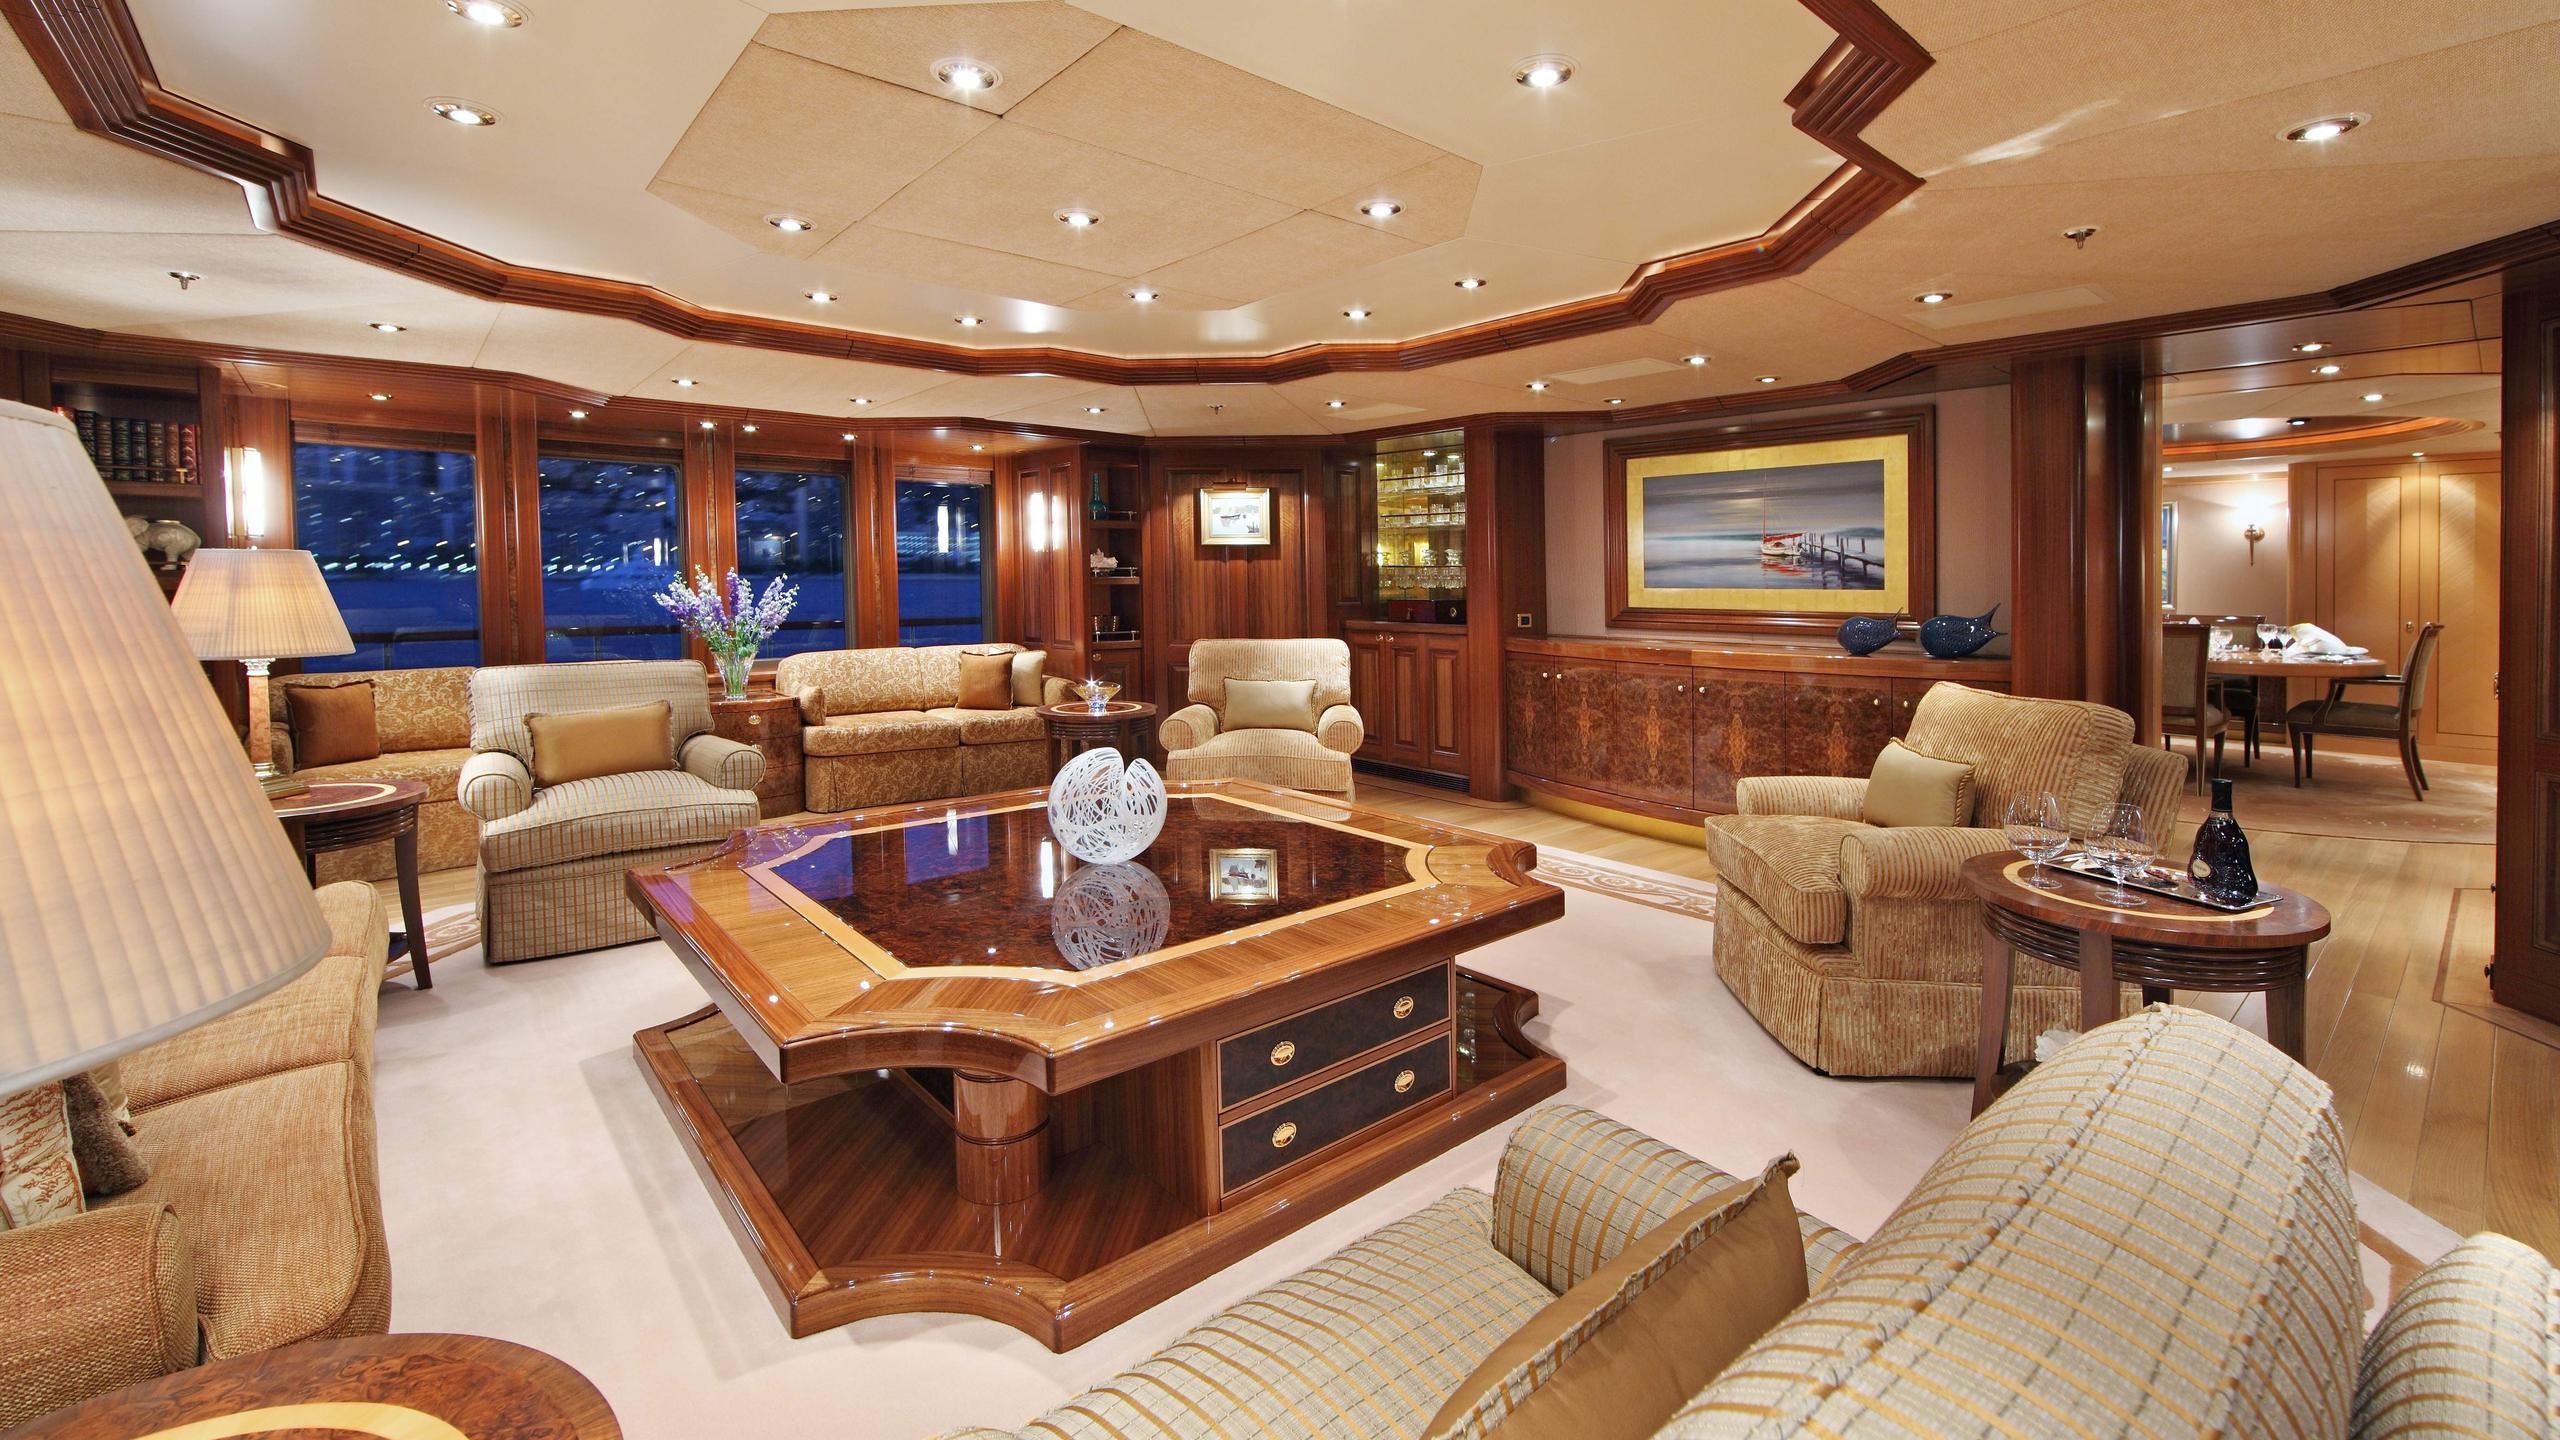 laurel-motor-yacht-delta-marine-2006-73m-main-saloon